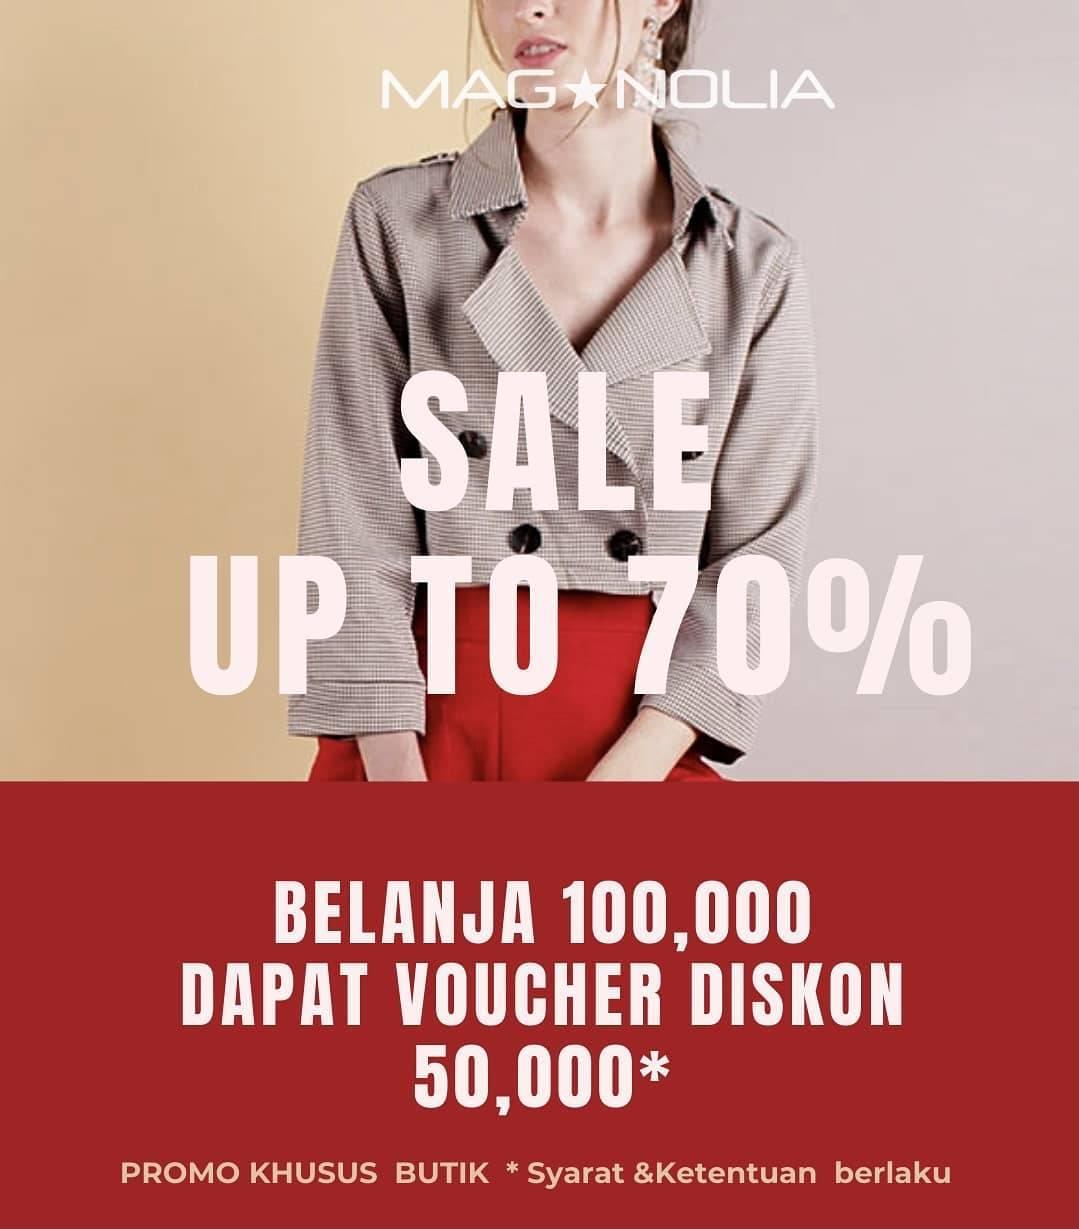 Diskon Magnolia Sale Up To 70% Off